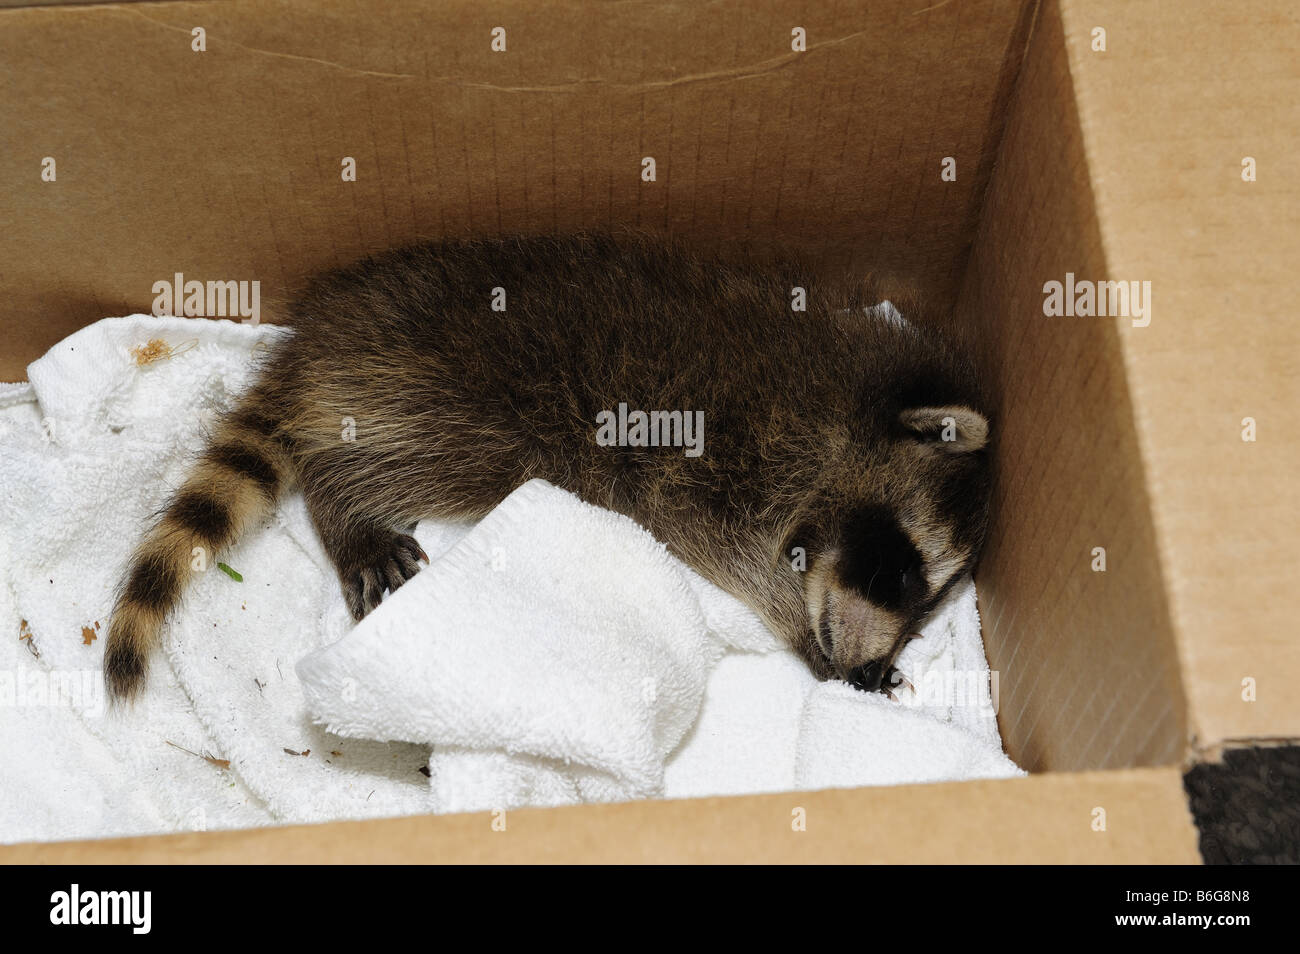 Bébé sauvé raccoon dormir dans un box Photo Stock